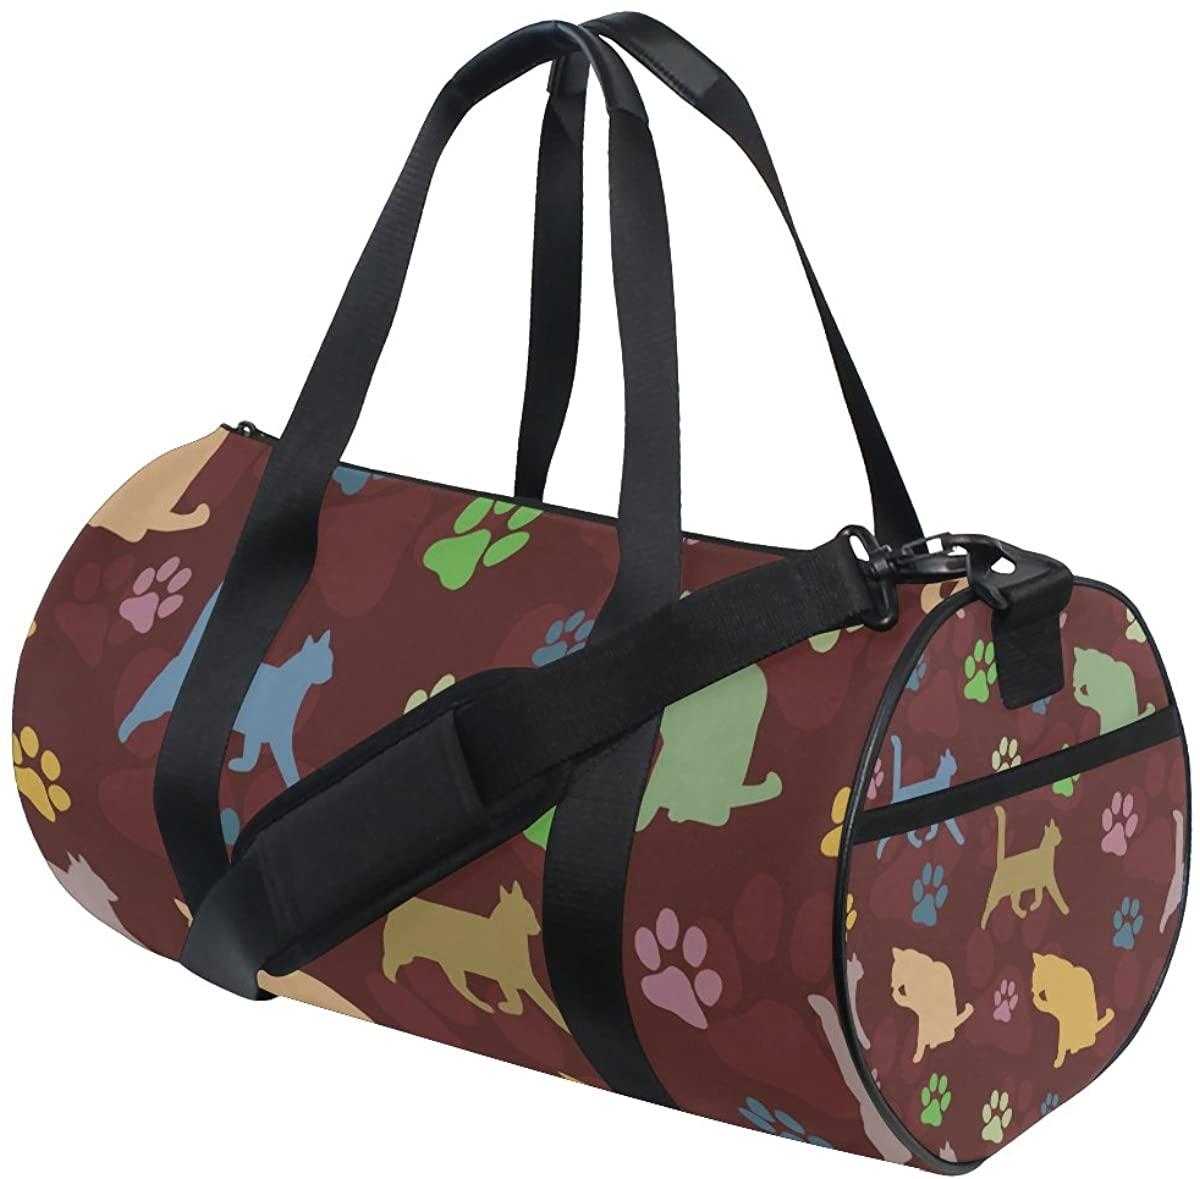 Duffel Cat Footprints Fitness Gym Bags Canvas Sport Shoulder Bag for Men Women